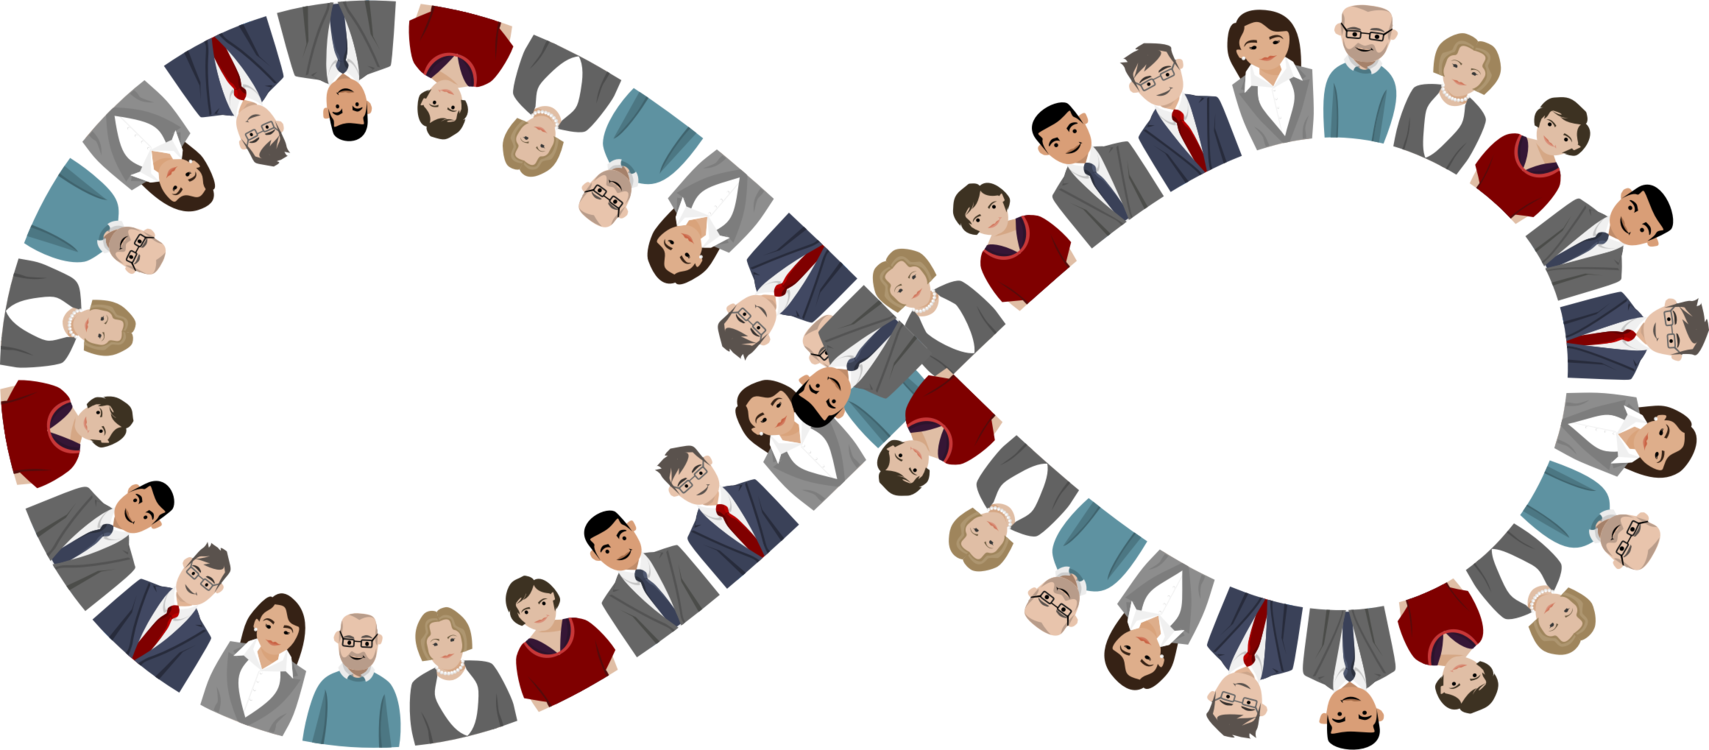 Teamwork clipart debate team. Small transparent cartoon